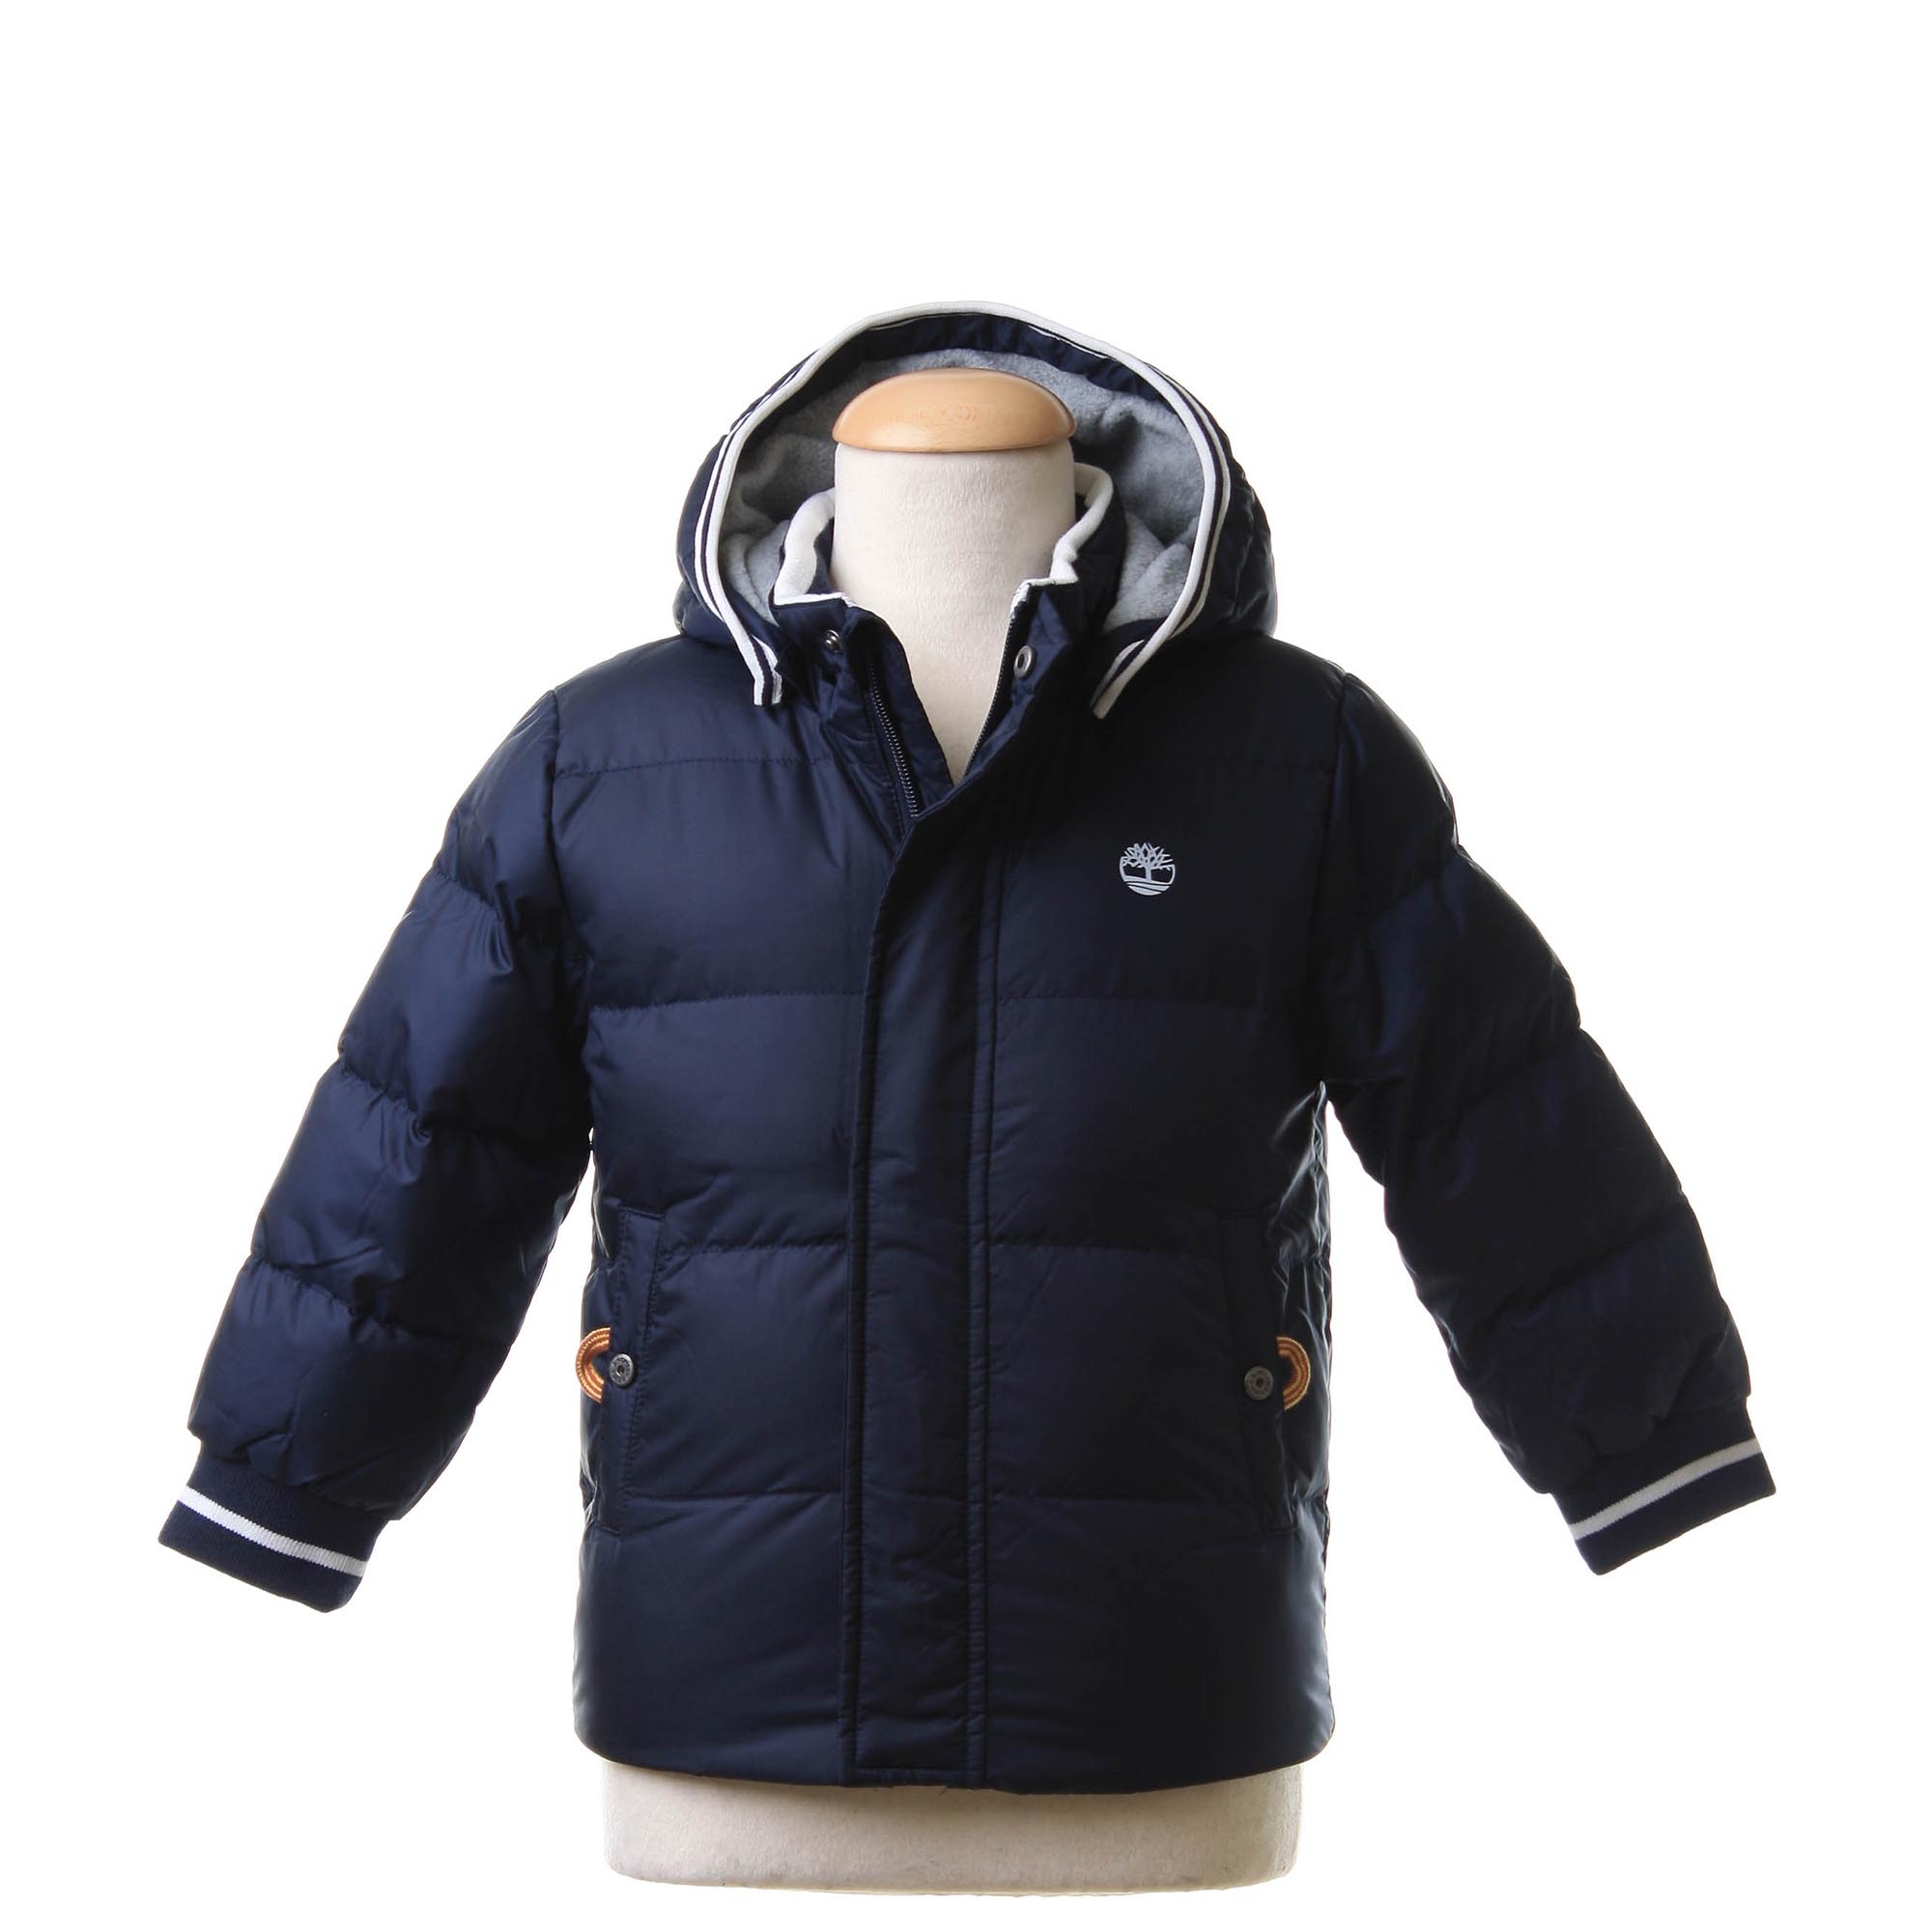 Timberland - Piumino Waterproof Con Cappuccio Blu Navy - annameglio.com  shop online 2b8b92b3fc6